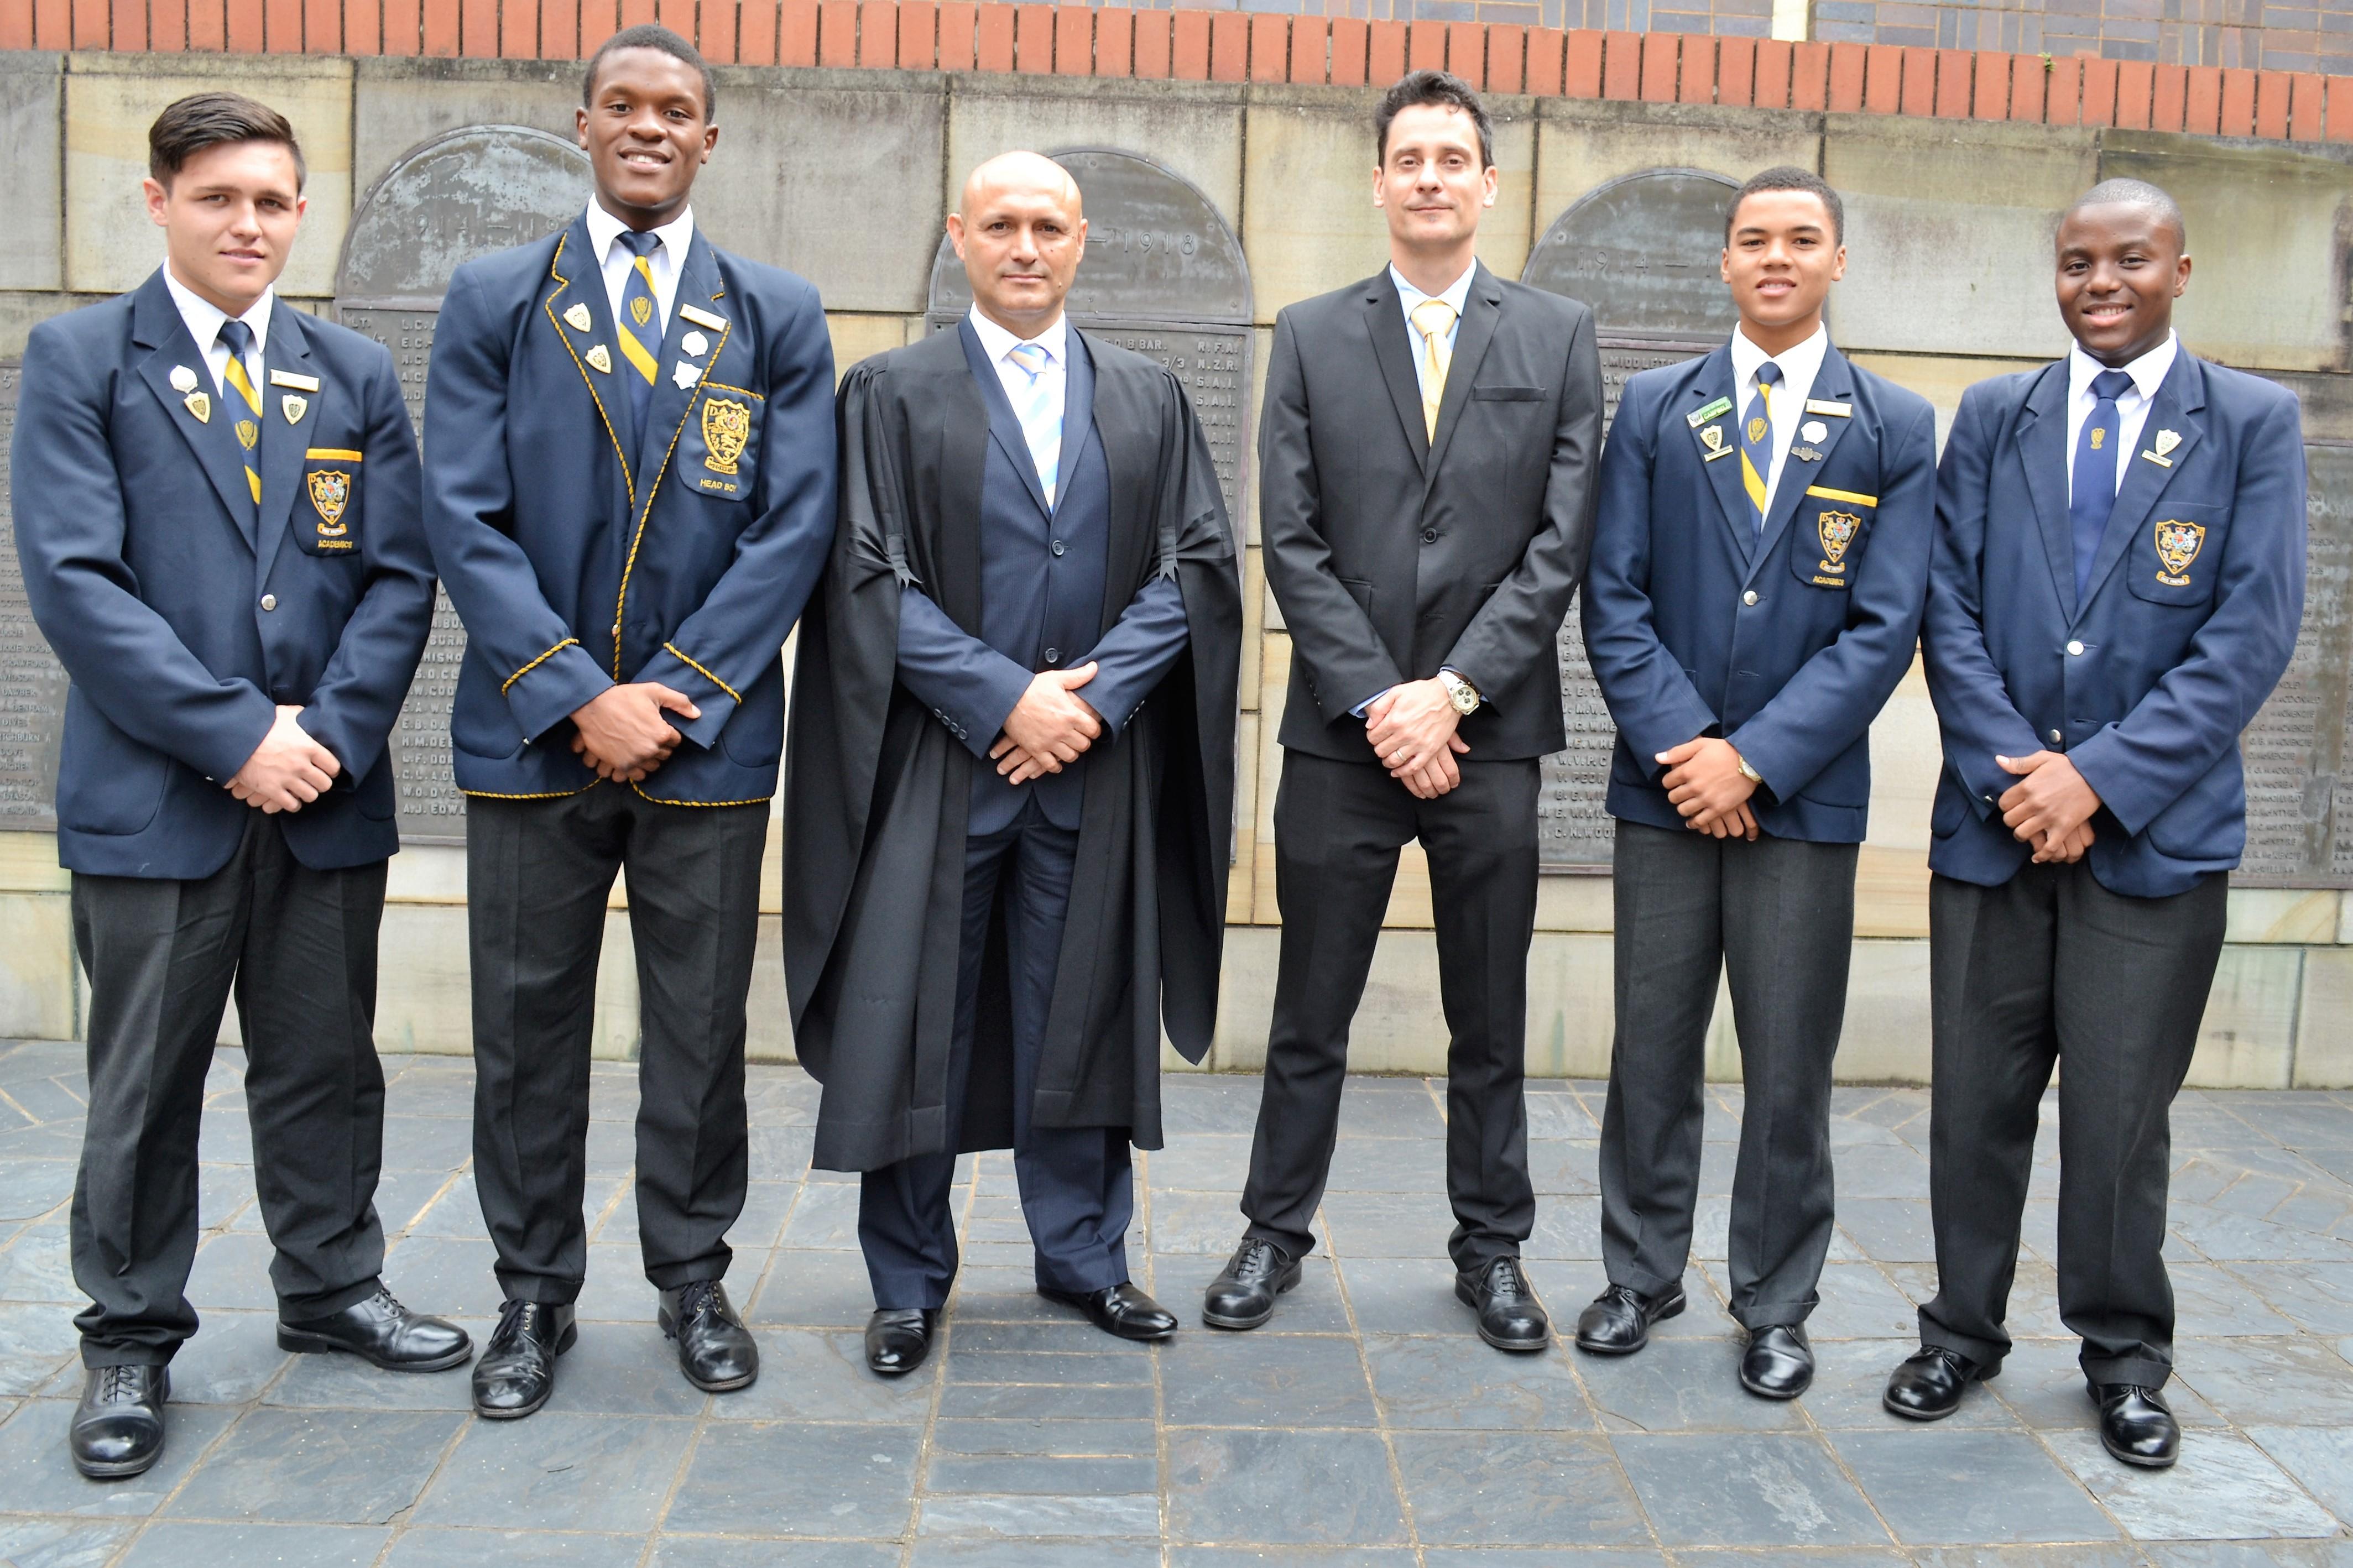 Image: Thomas Kempen, Phendulani Buthelezi, Tony Pinheiro, Winston Owen, Matthew Henley and Samkelo Ntetha